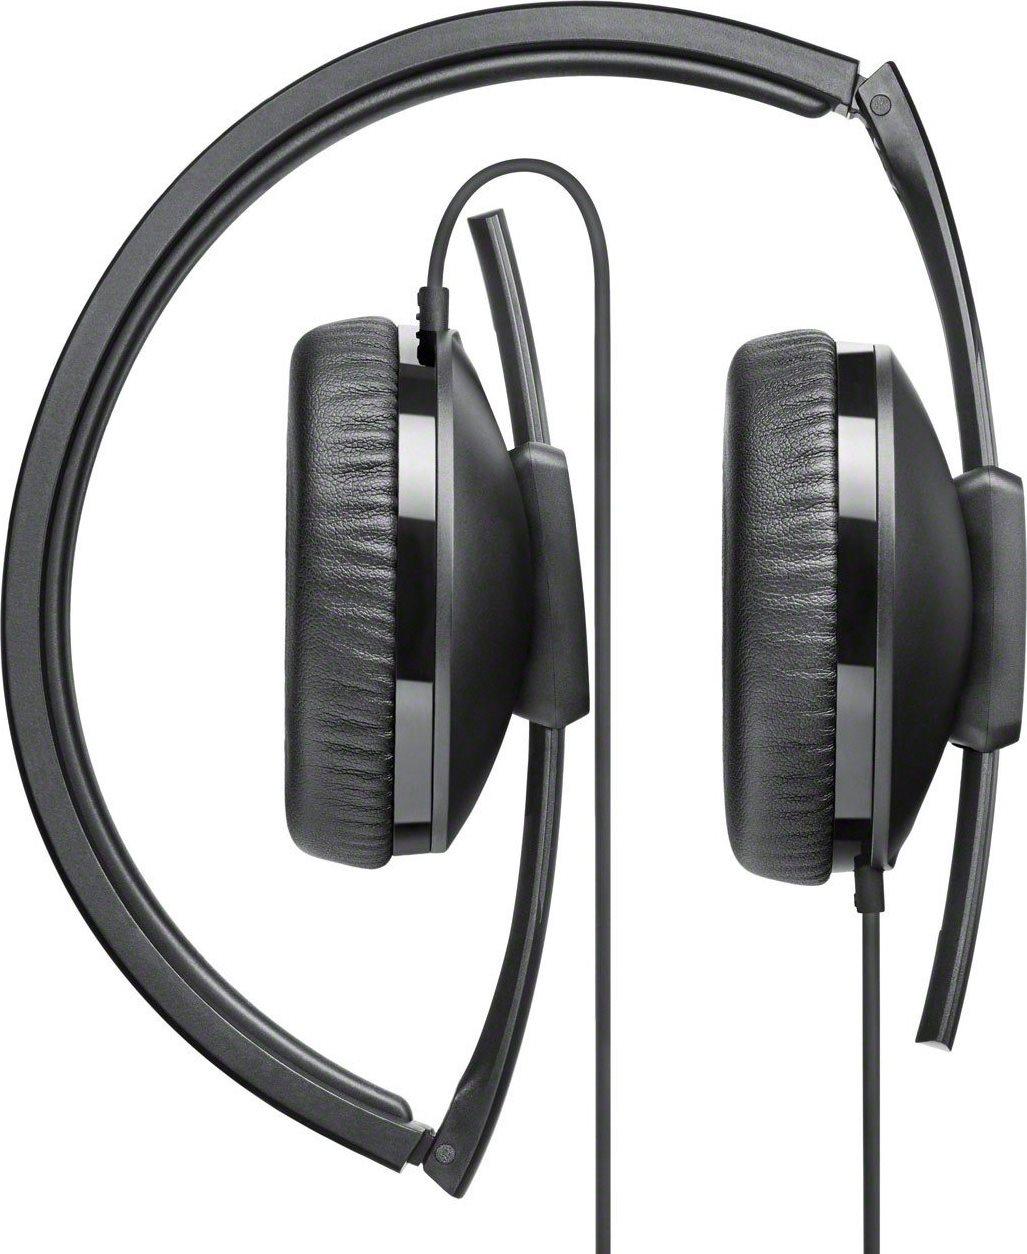 Sennheiser HD2.10 Cuffie Stereo Mp3 ad Archetto Cuffie On Ear pieghevoli  Nero v. d21a2d9f5a1c